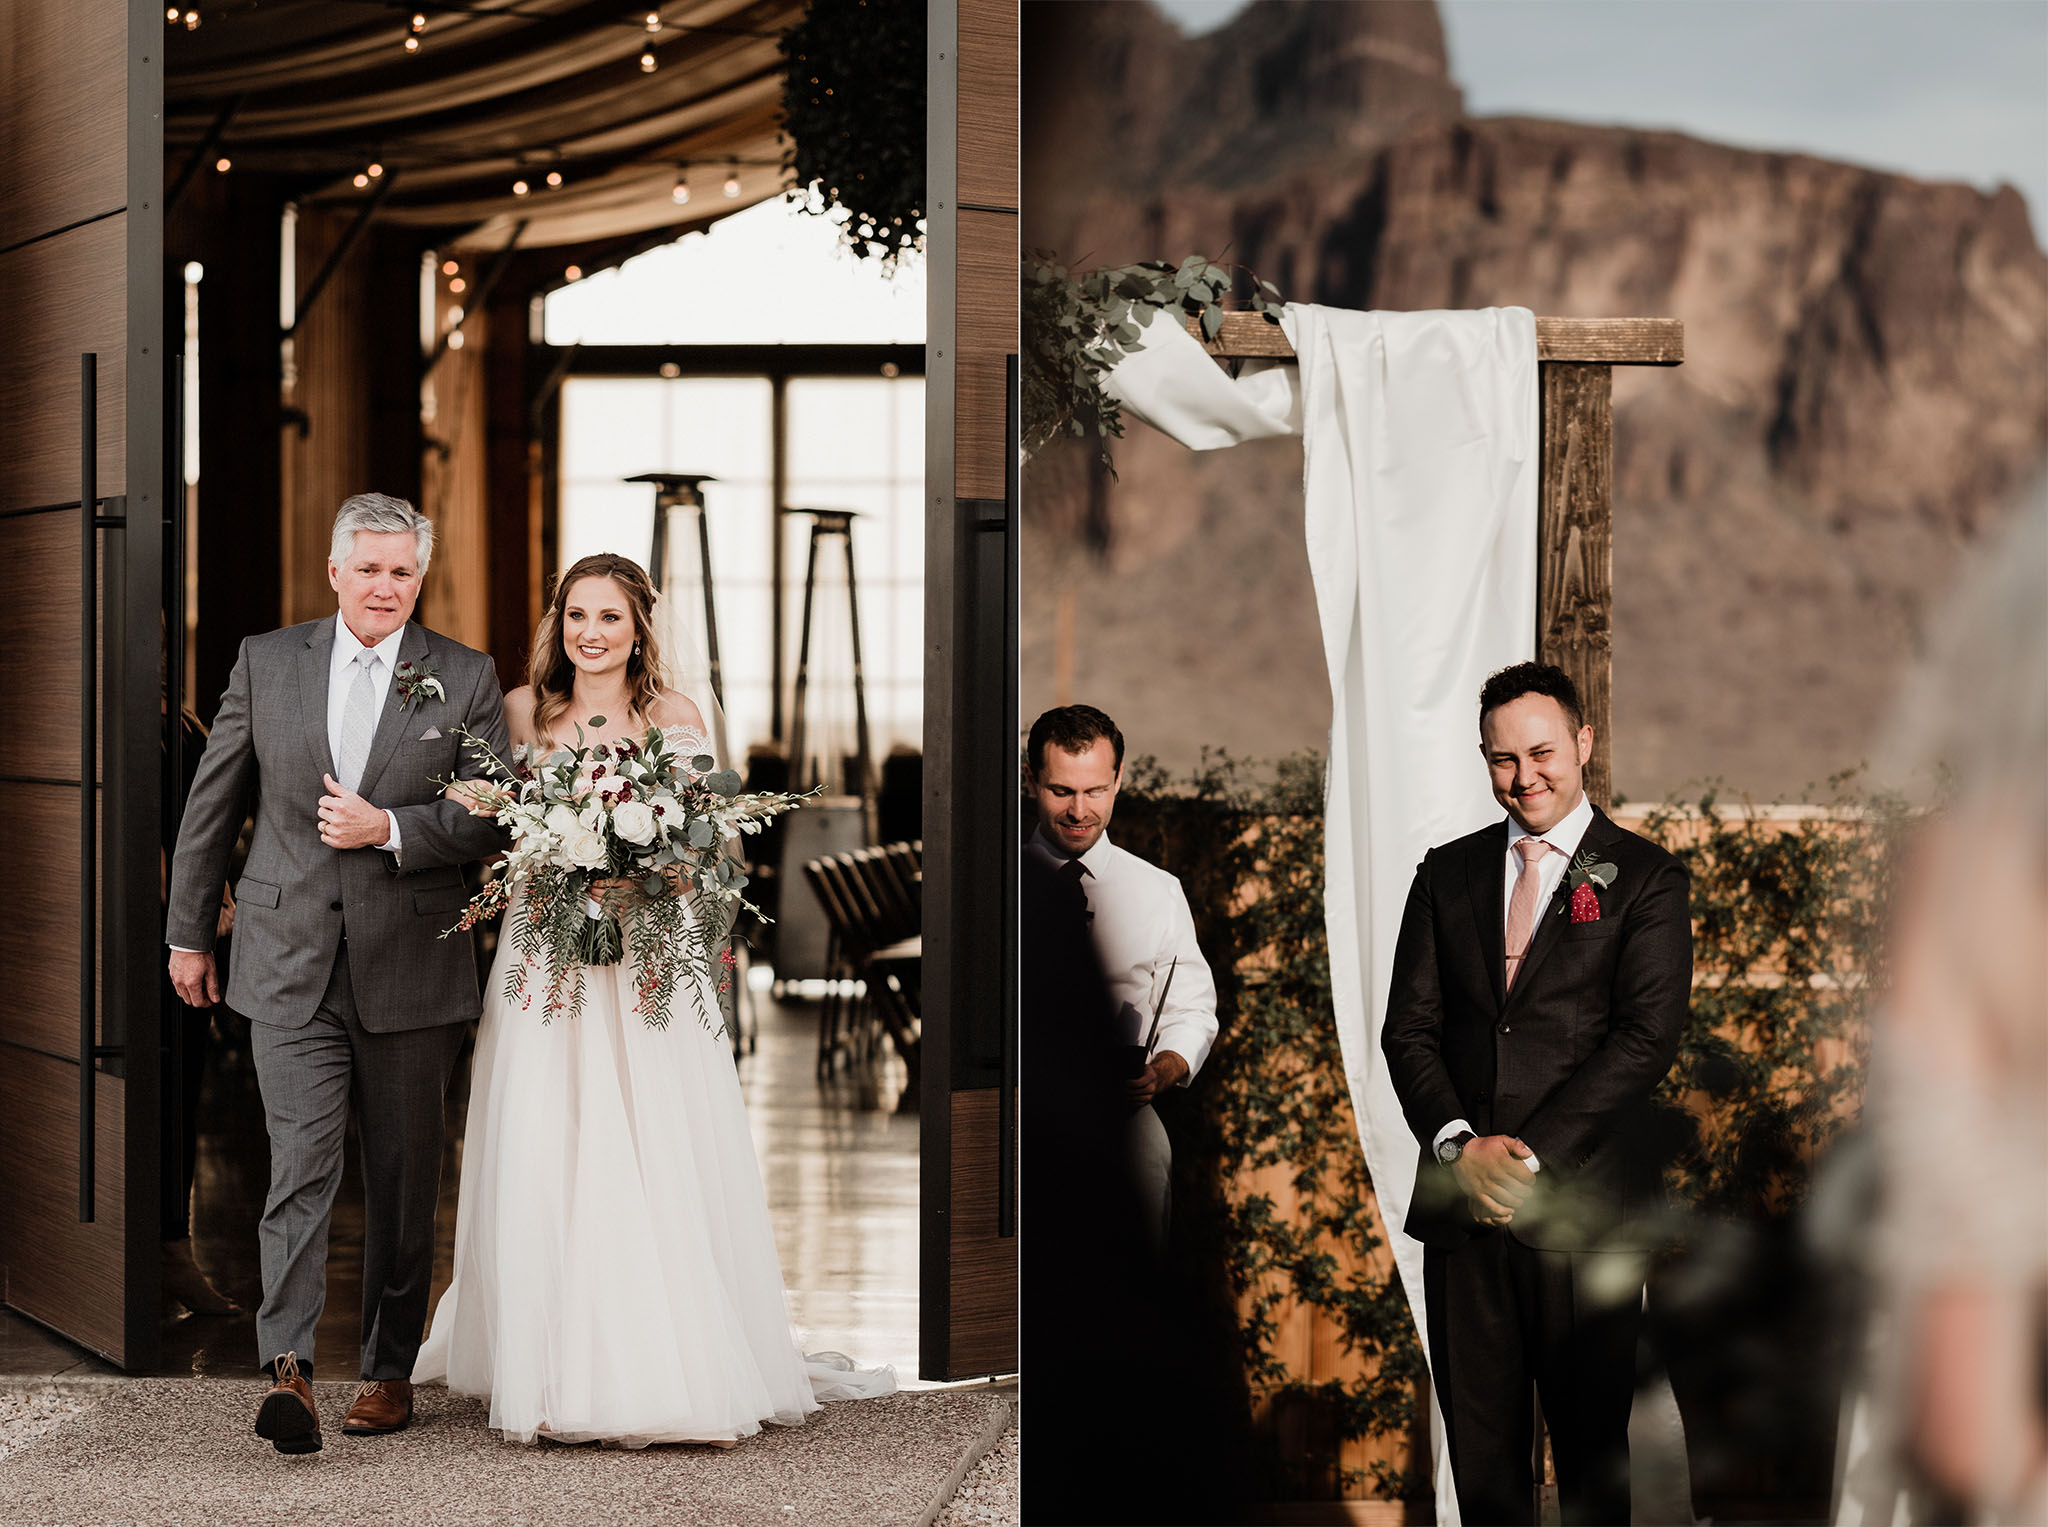 Arizona-Wedding-Photographer-The-Paseo-Venue16.jpg